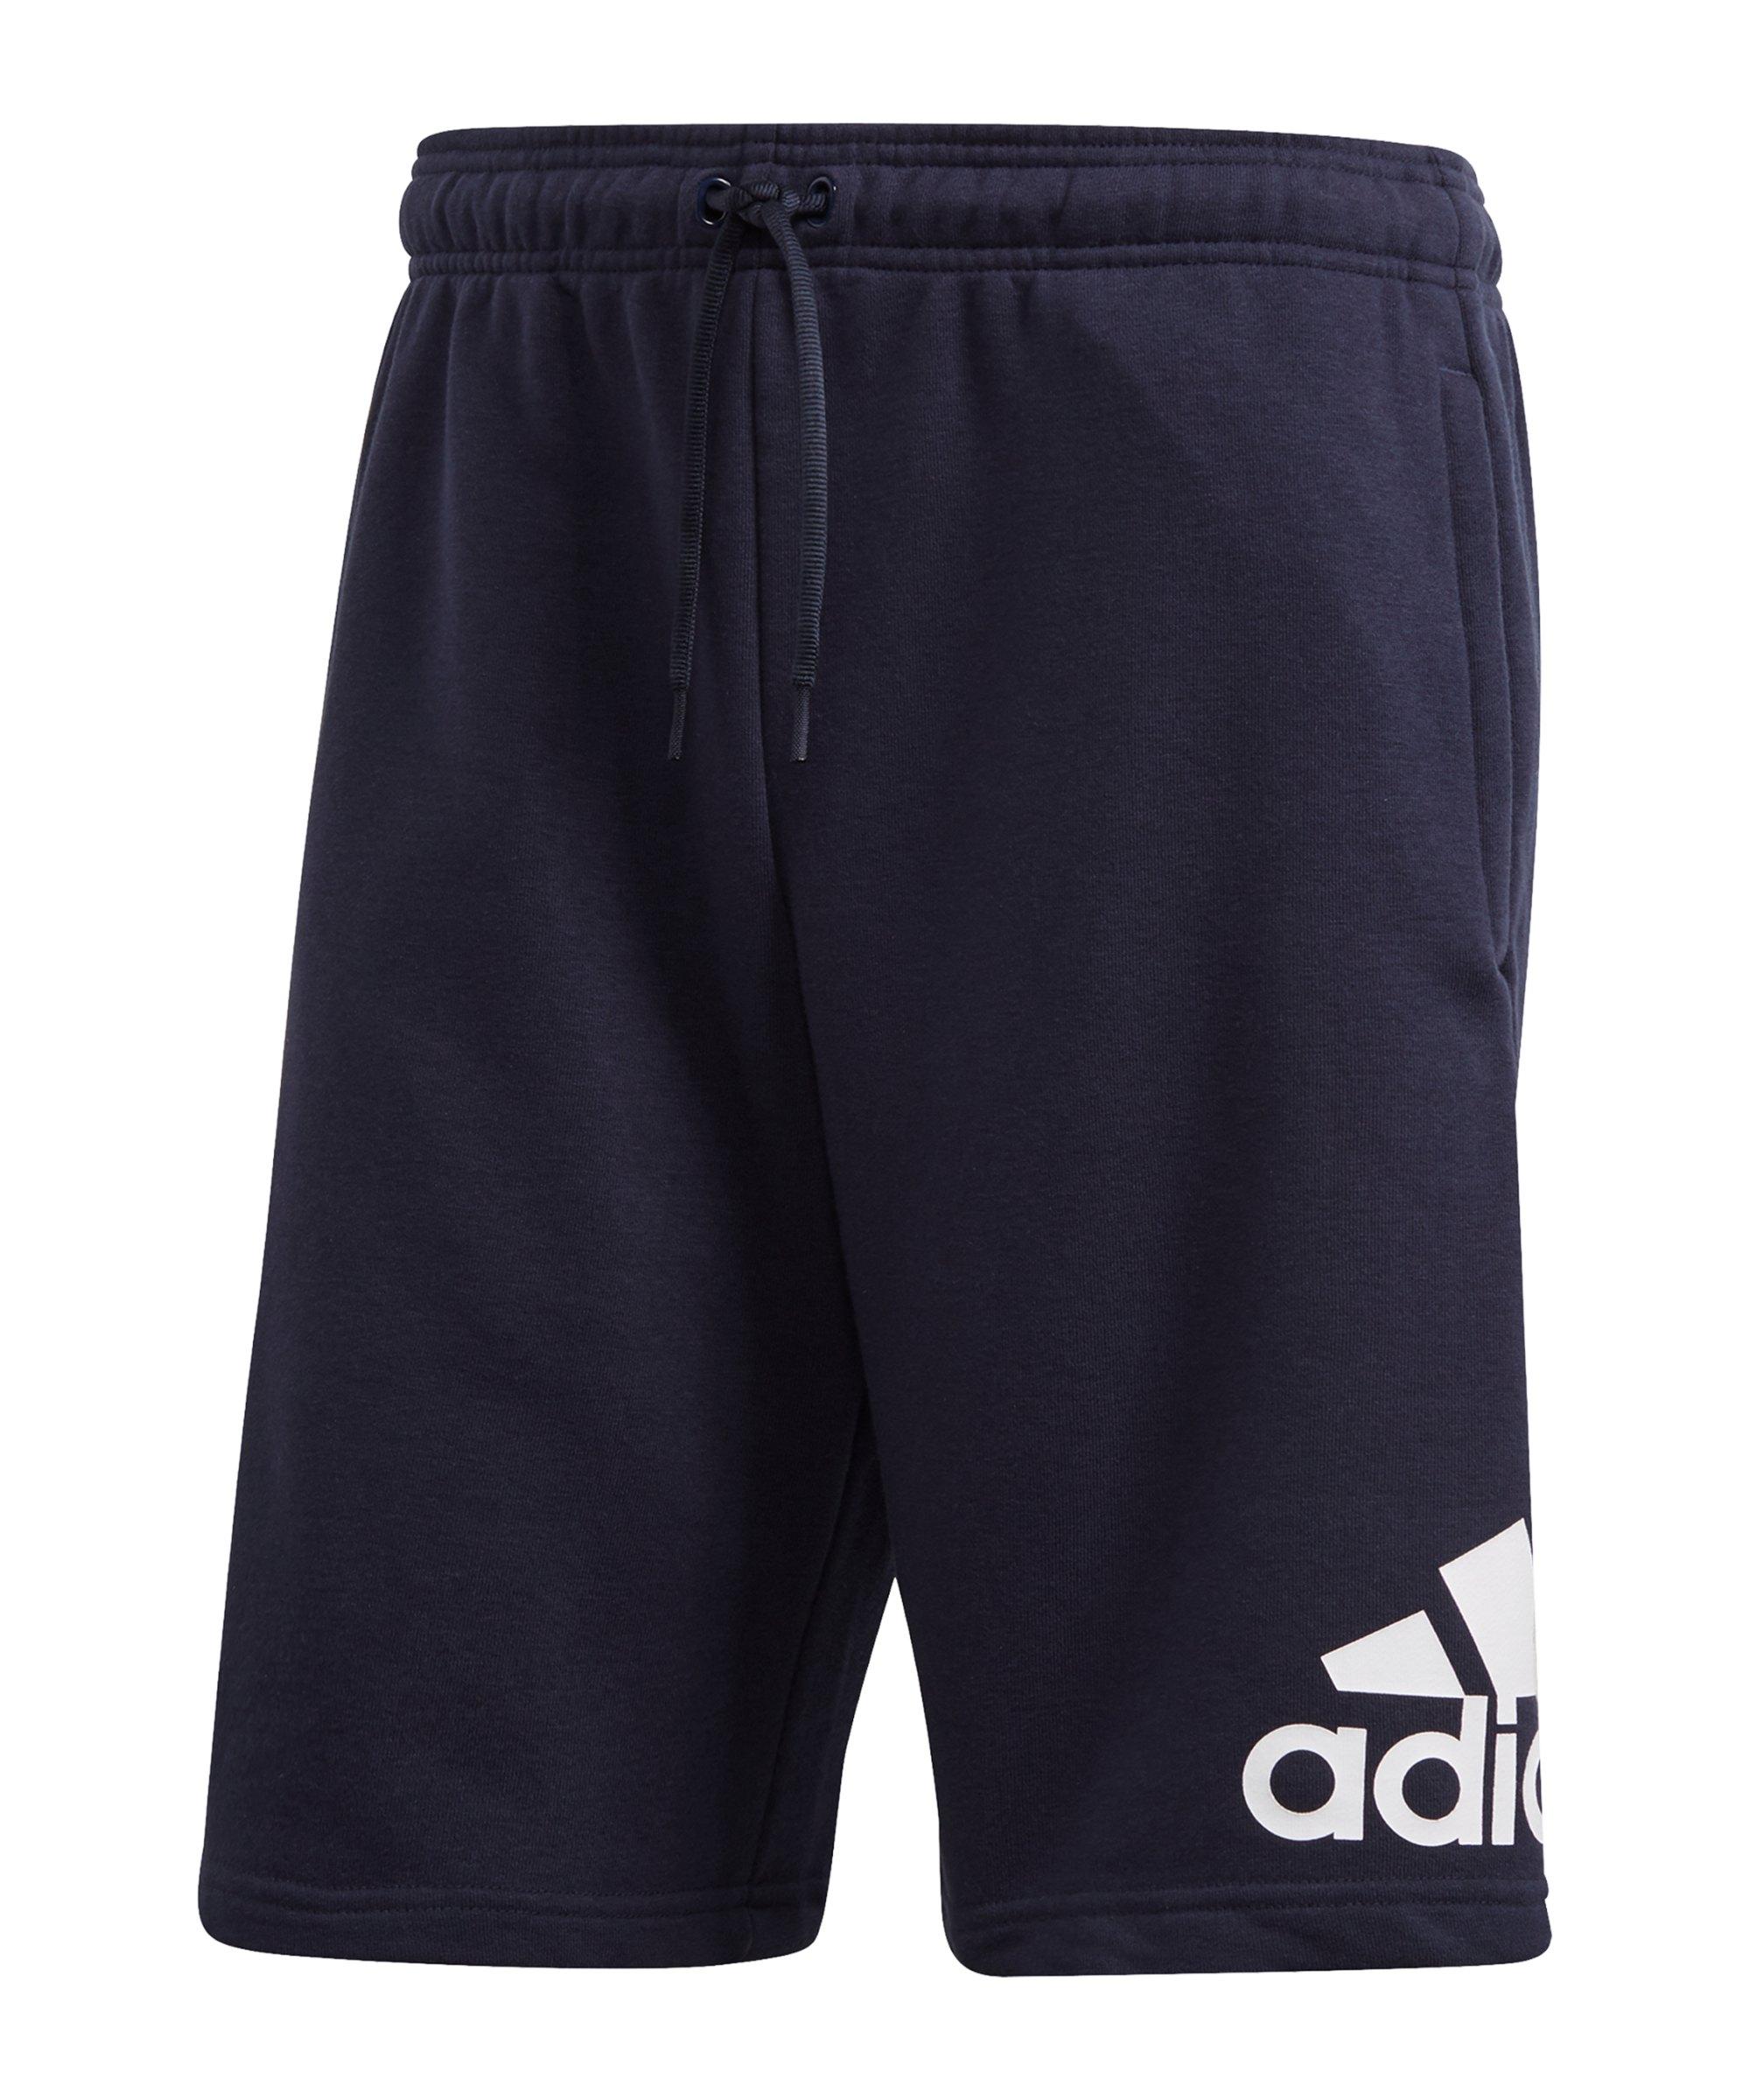 adidas Must Haves Badge of Sport Short Blau Weiss - blau